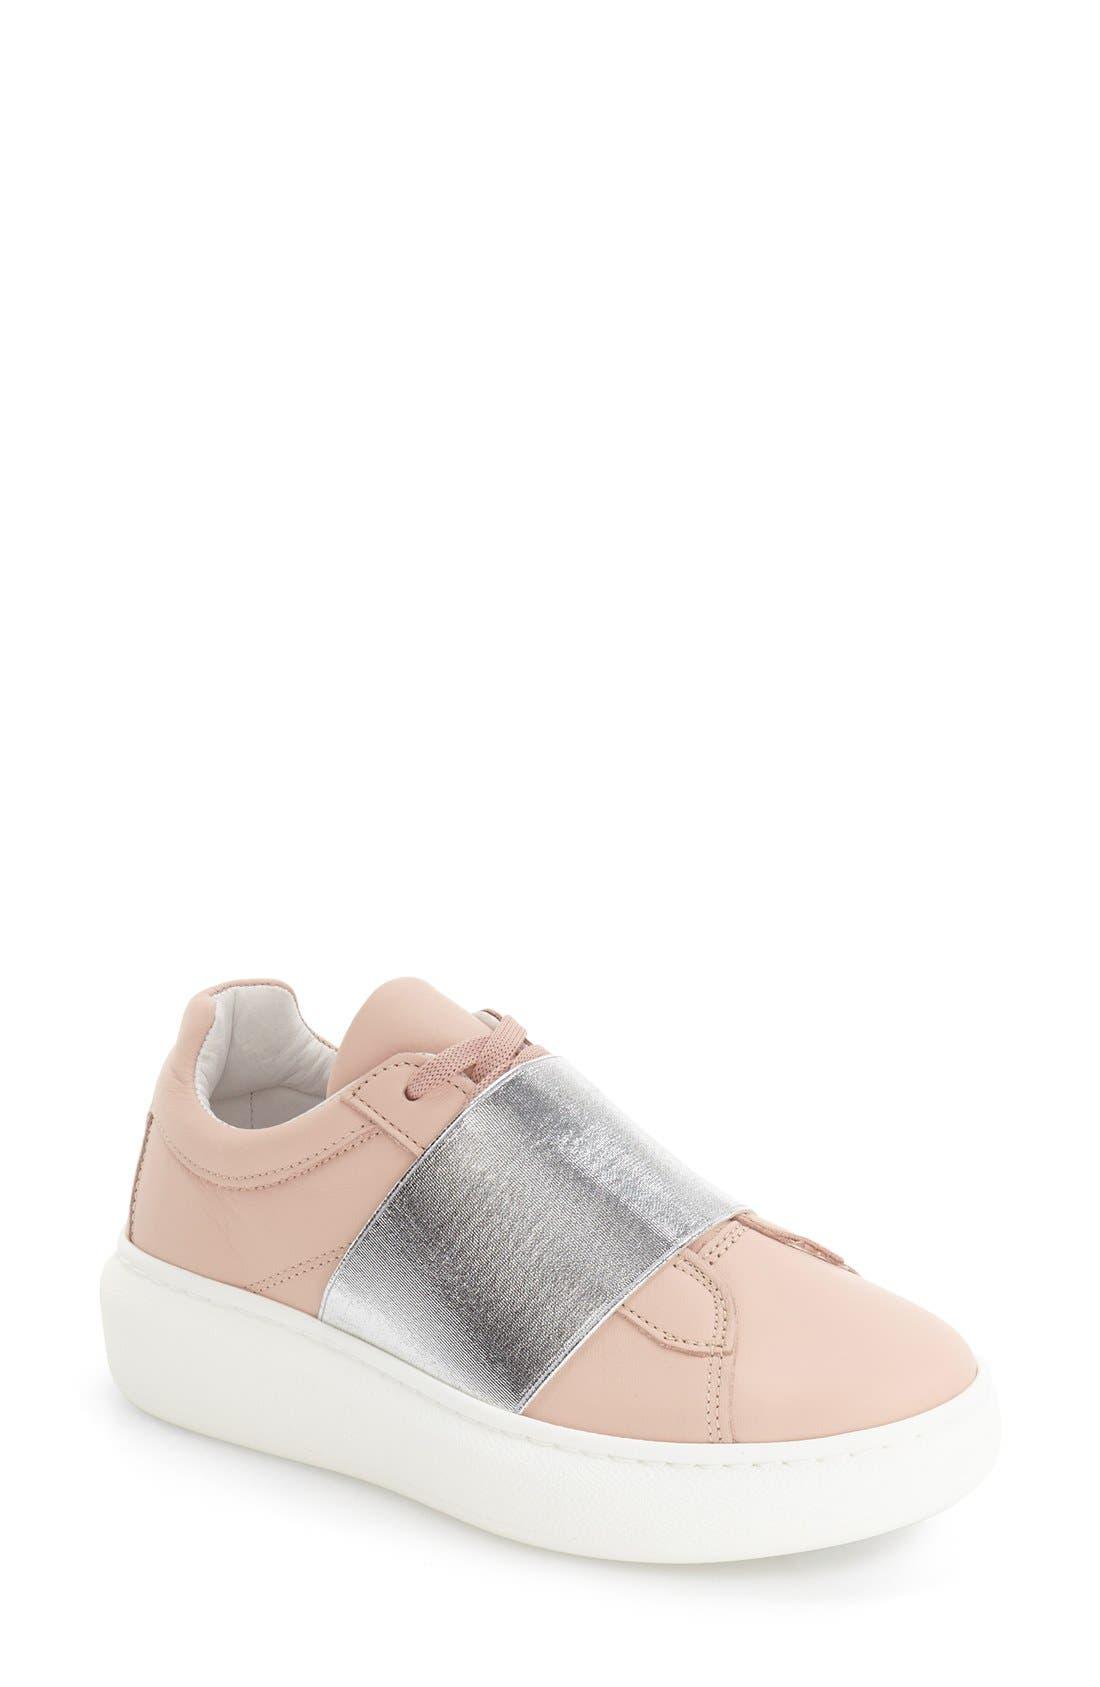 Turin Metallic Strap Platform Sneaker,                         Main,                         color, Pink Multi